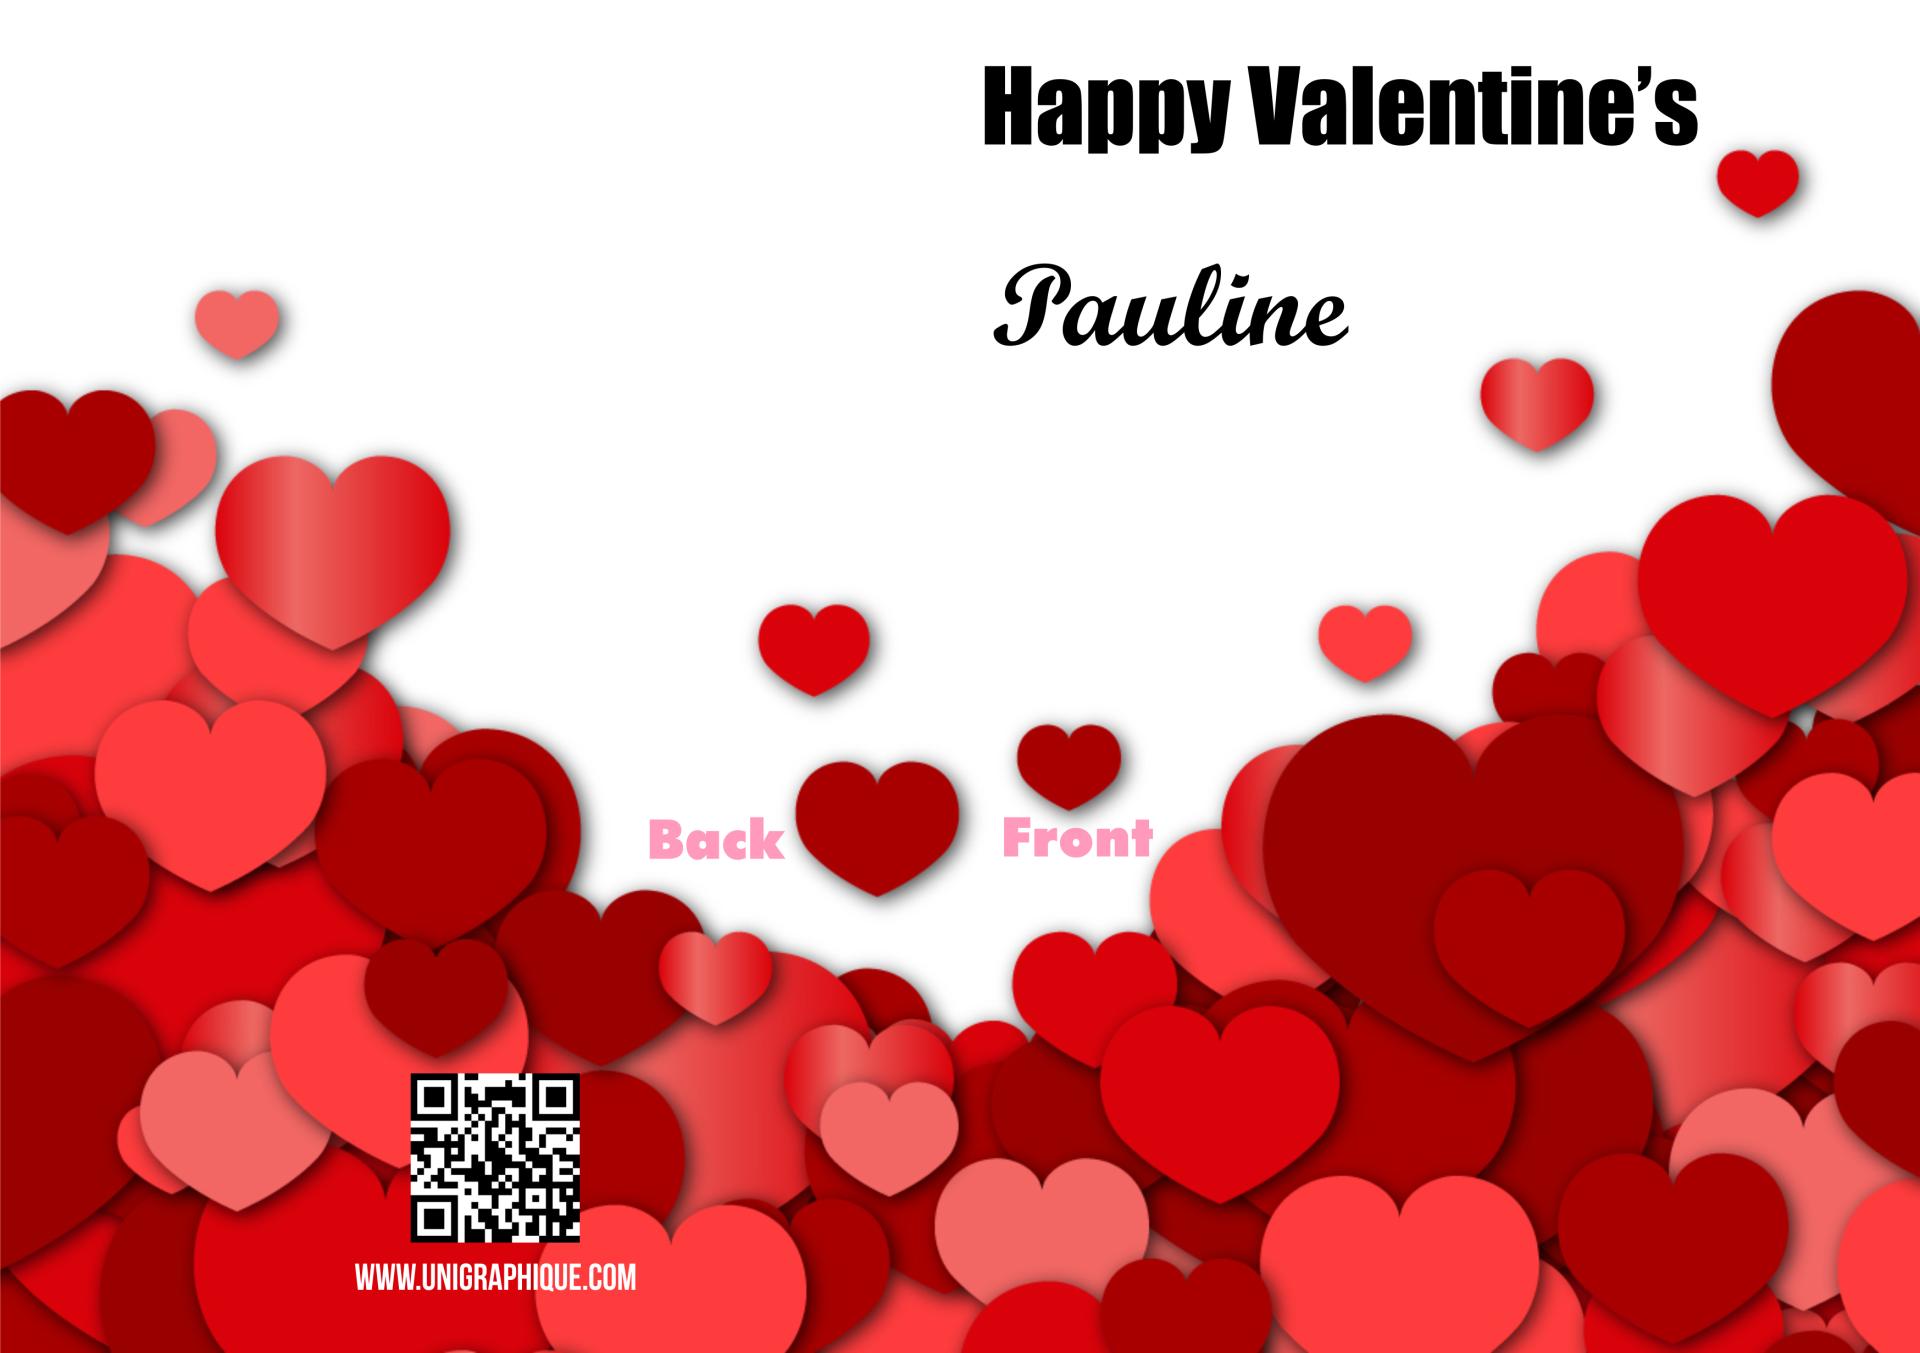 Get a Free Valentine's Day Card Design